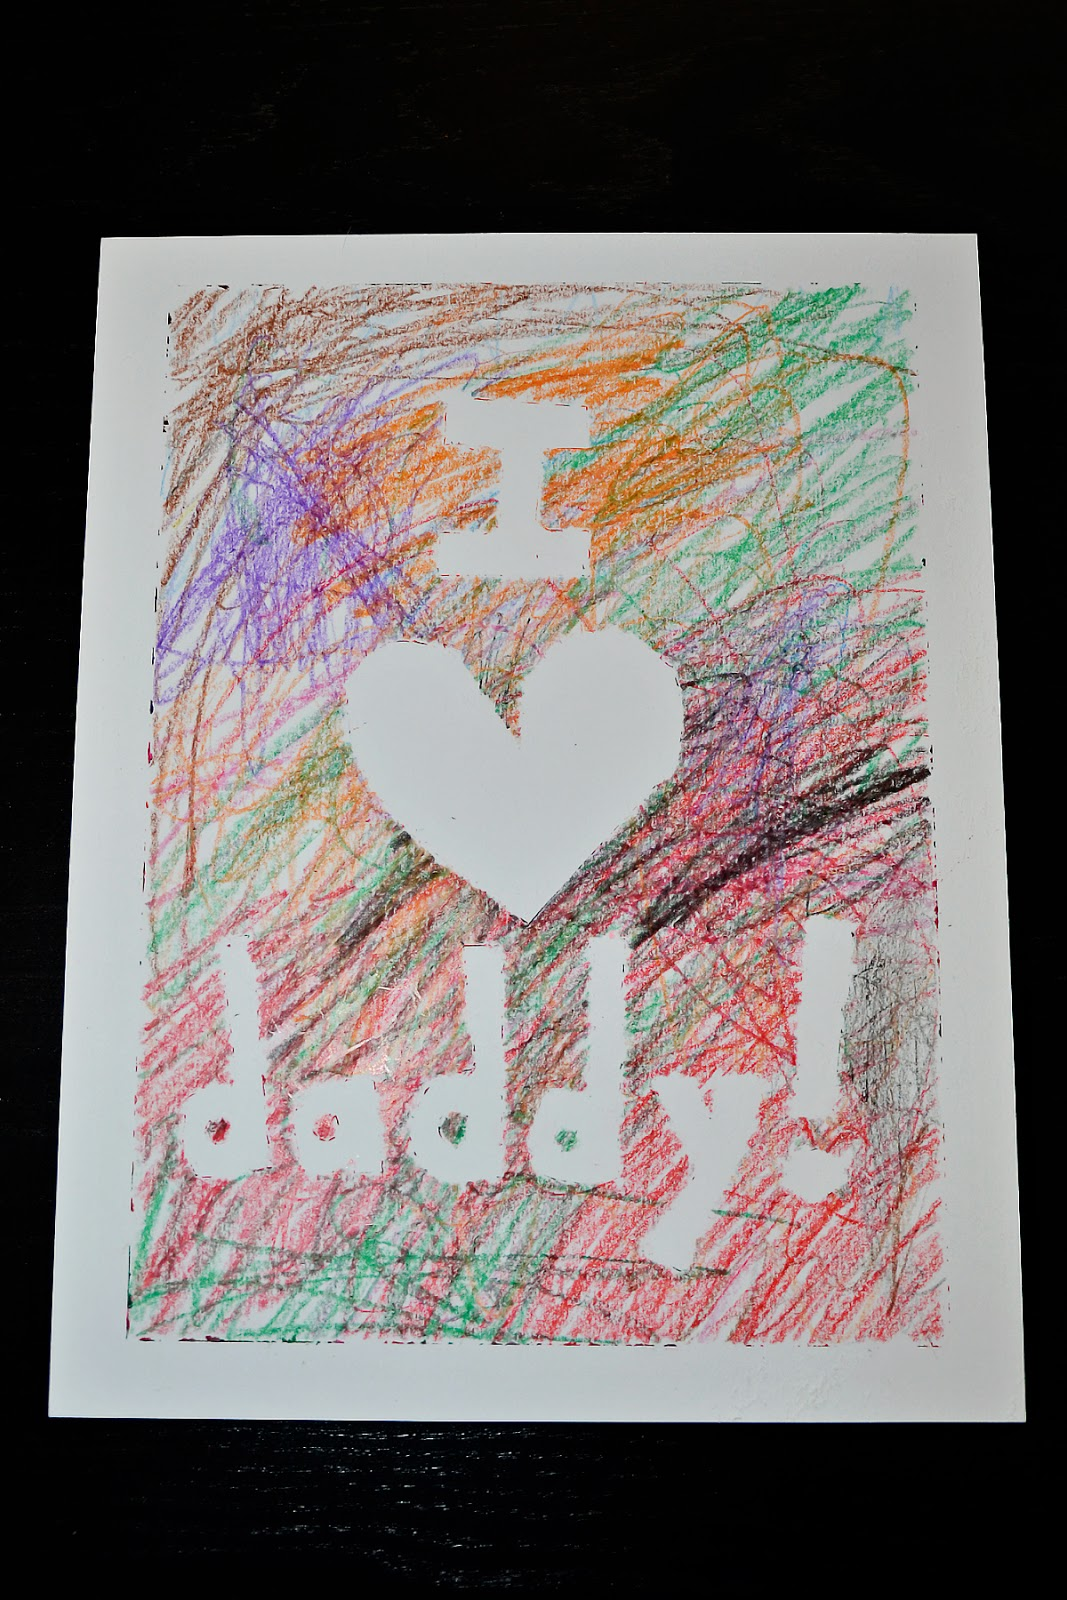 SOLIS PLUS ONE: Happy birthday, daddy!